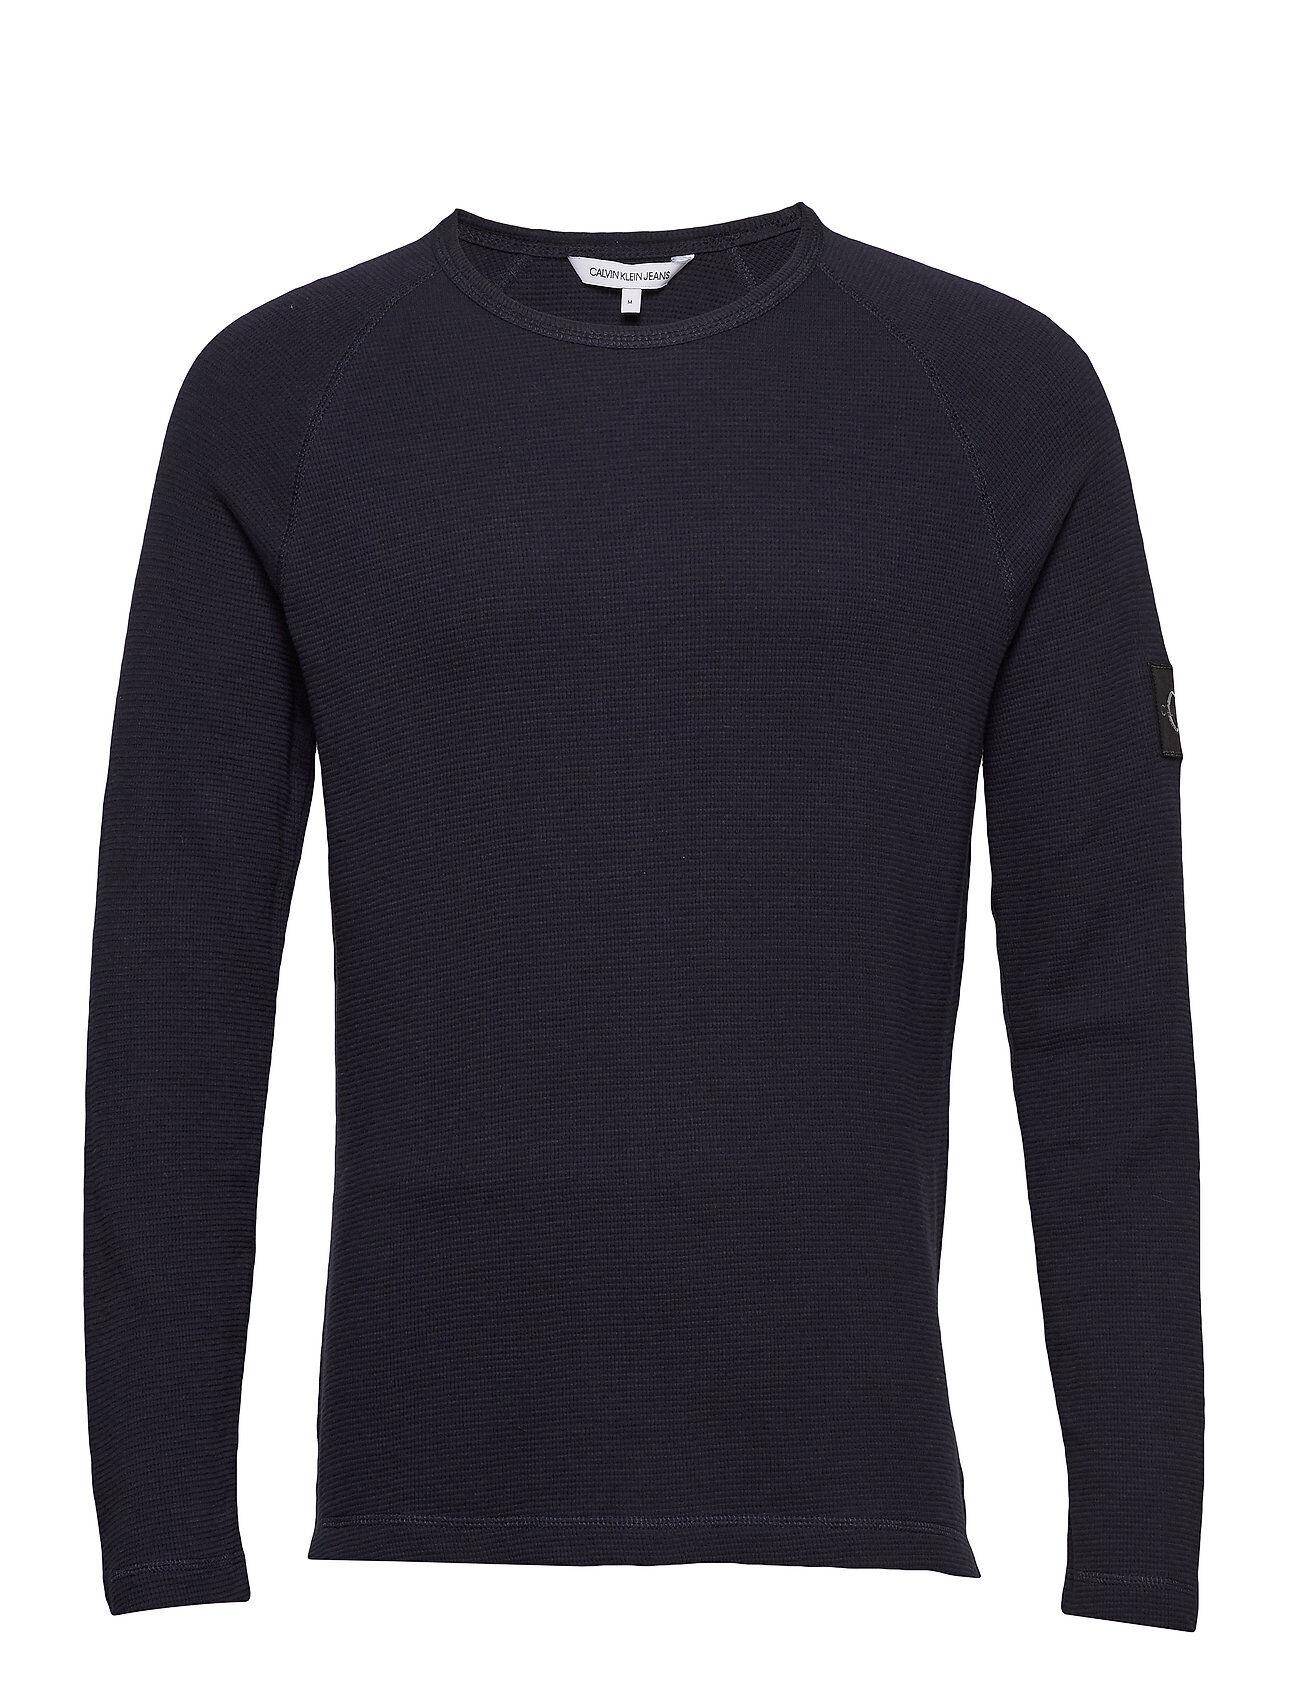 Image of Calvin Waffle Monogram Sleeve Slim L/S T-shirts Long-sleeved Sininen Calvin Klein Jeans